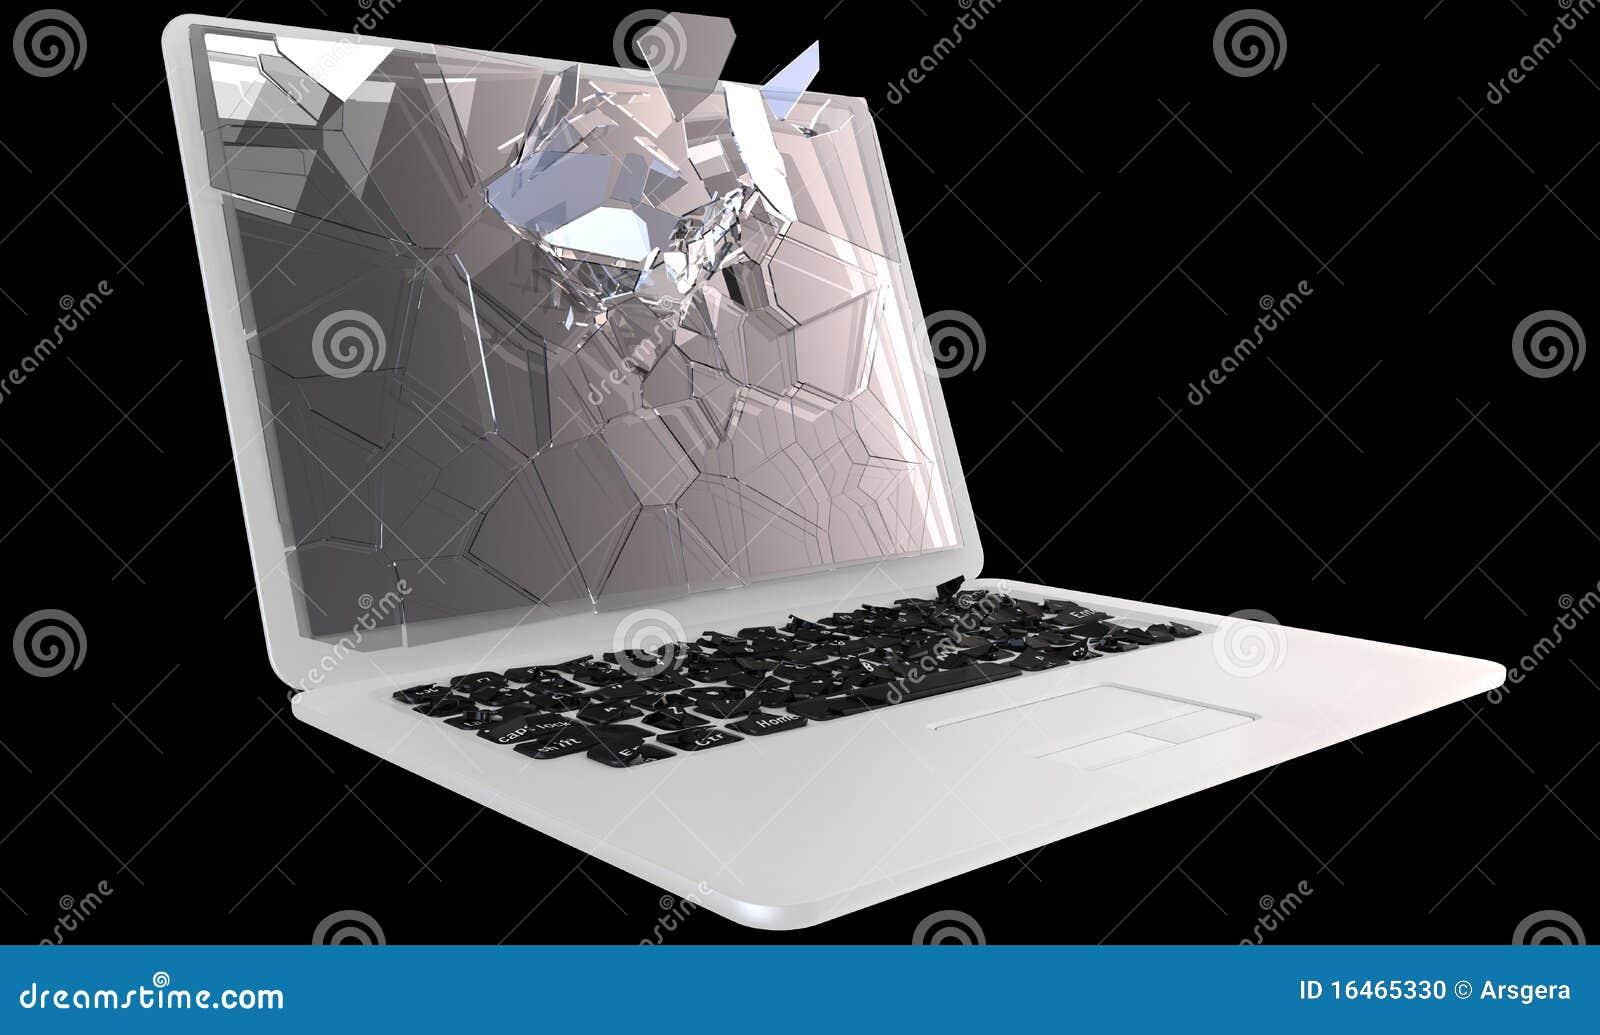 Cybercrime Laptop Pc Crash Stock Photo Image 16465330